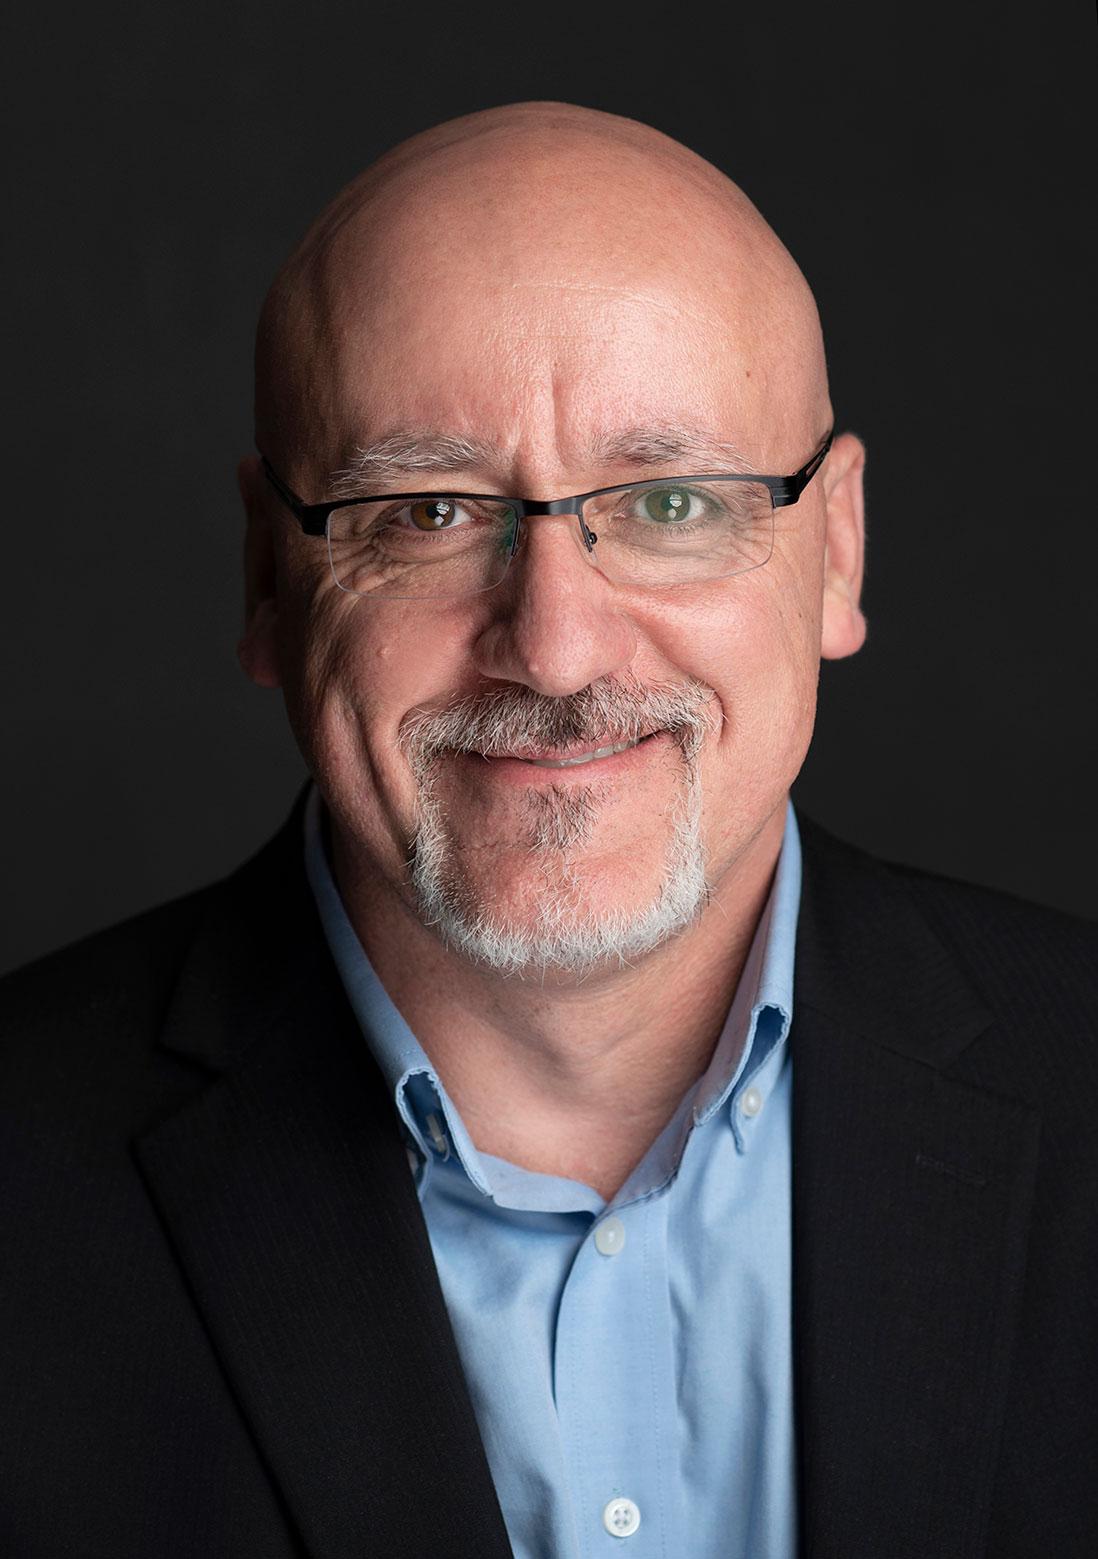 Studio headhshot of man wearing glasses